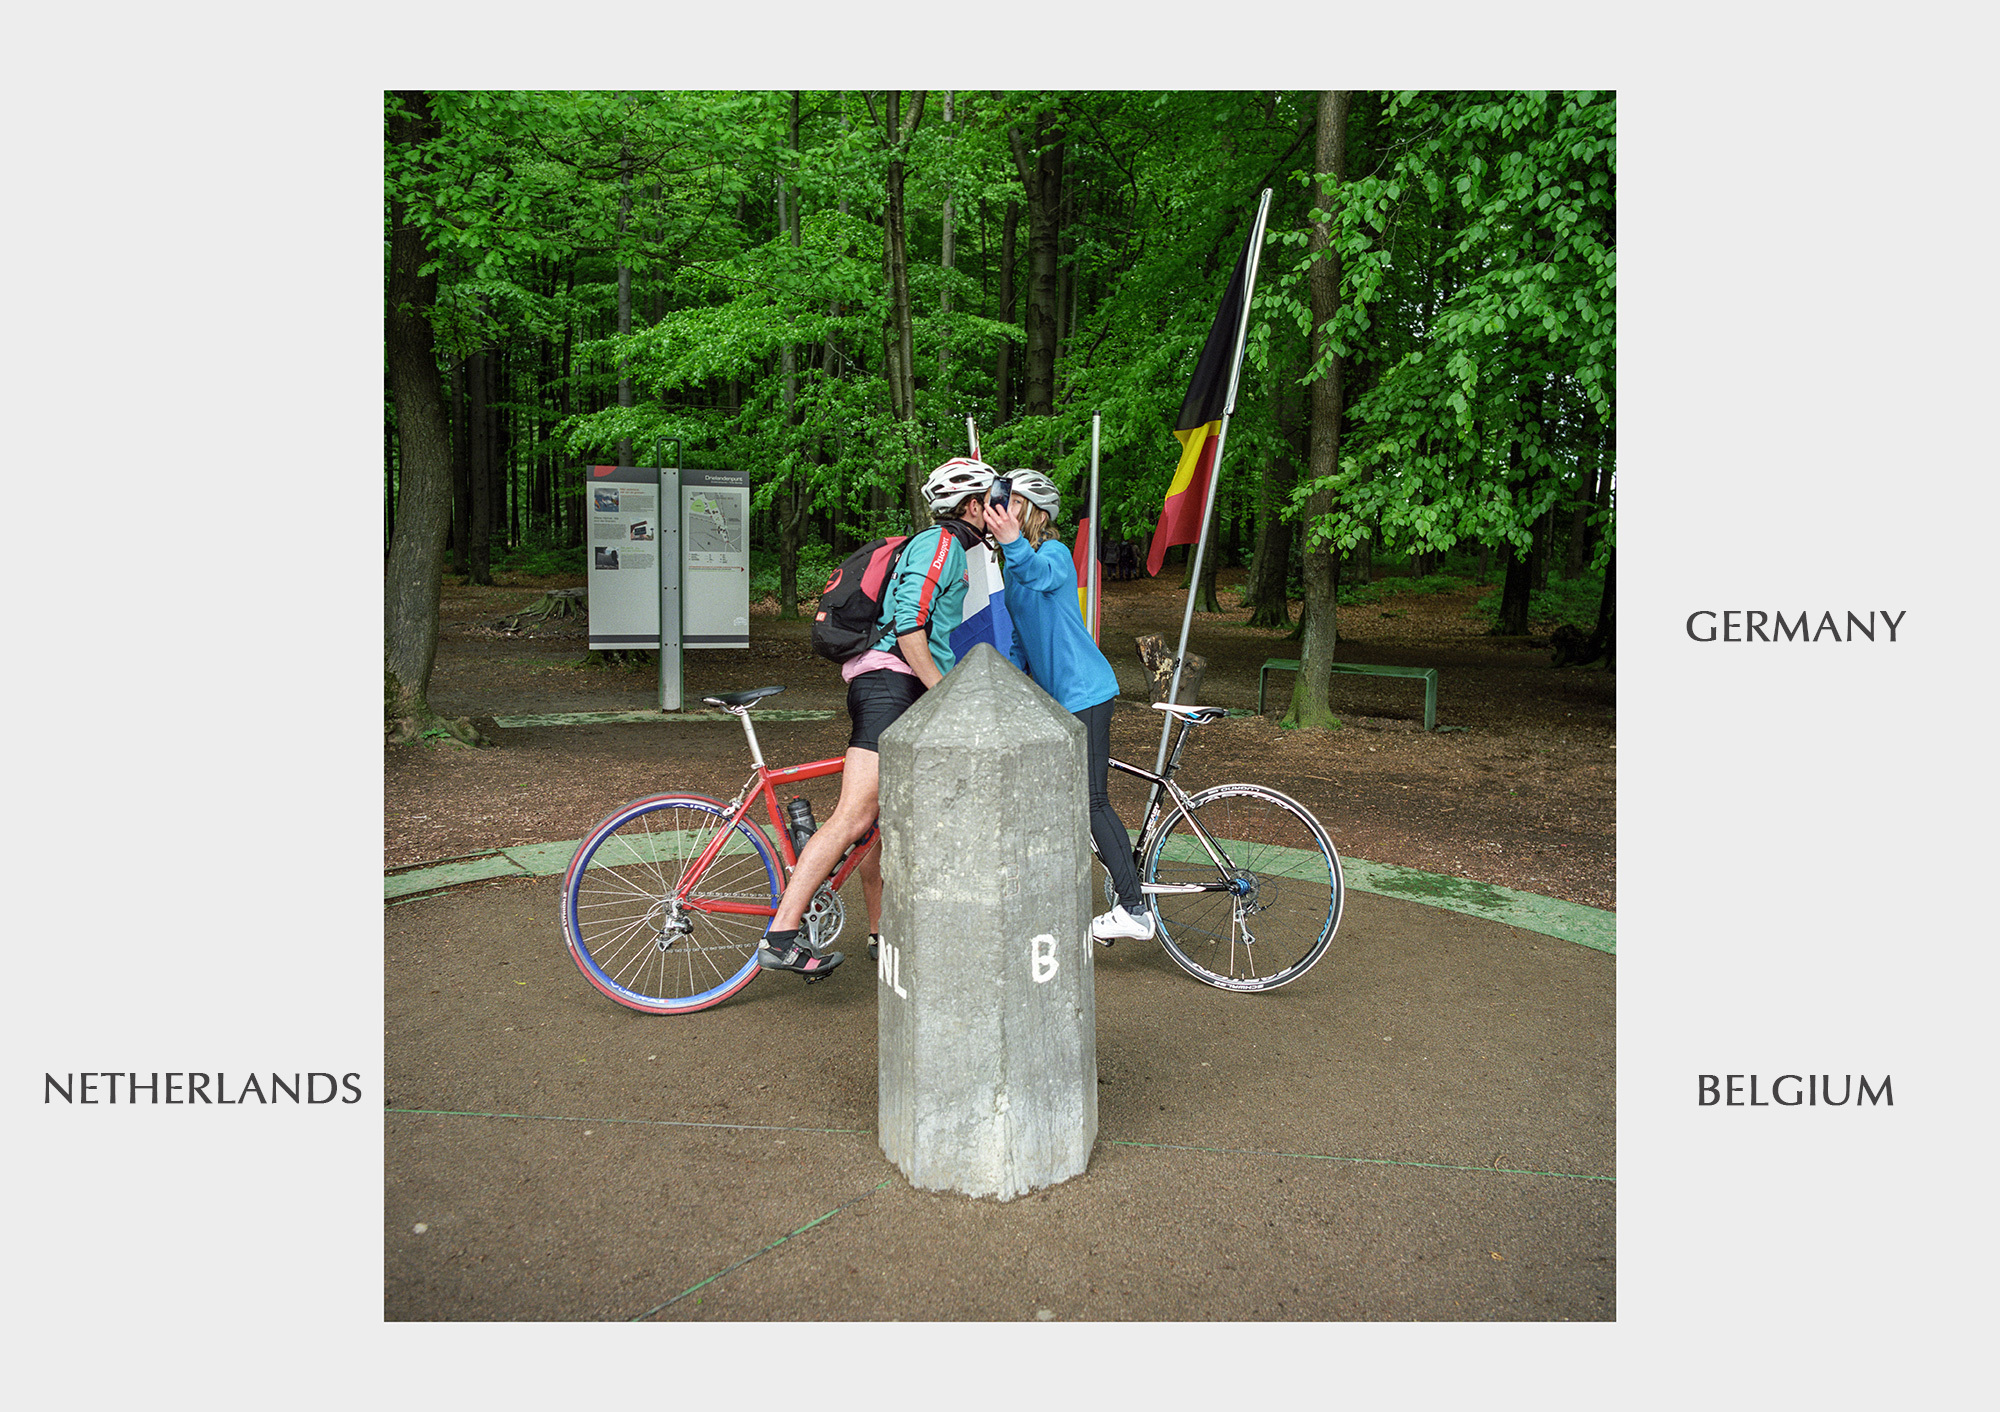 Картинки по запросу frontière belgique pays bas